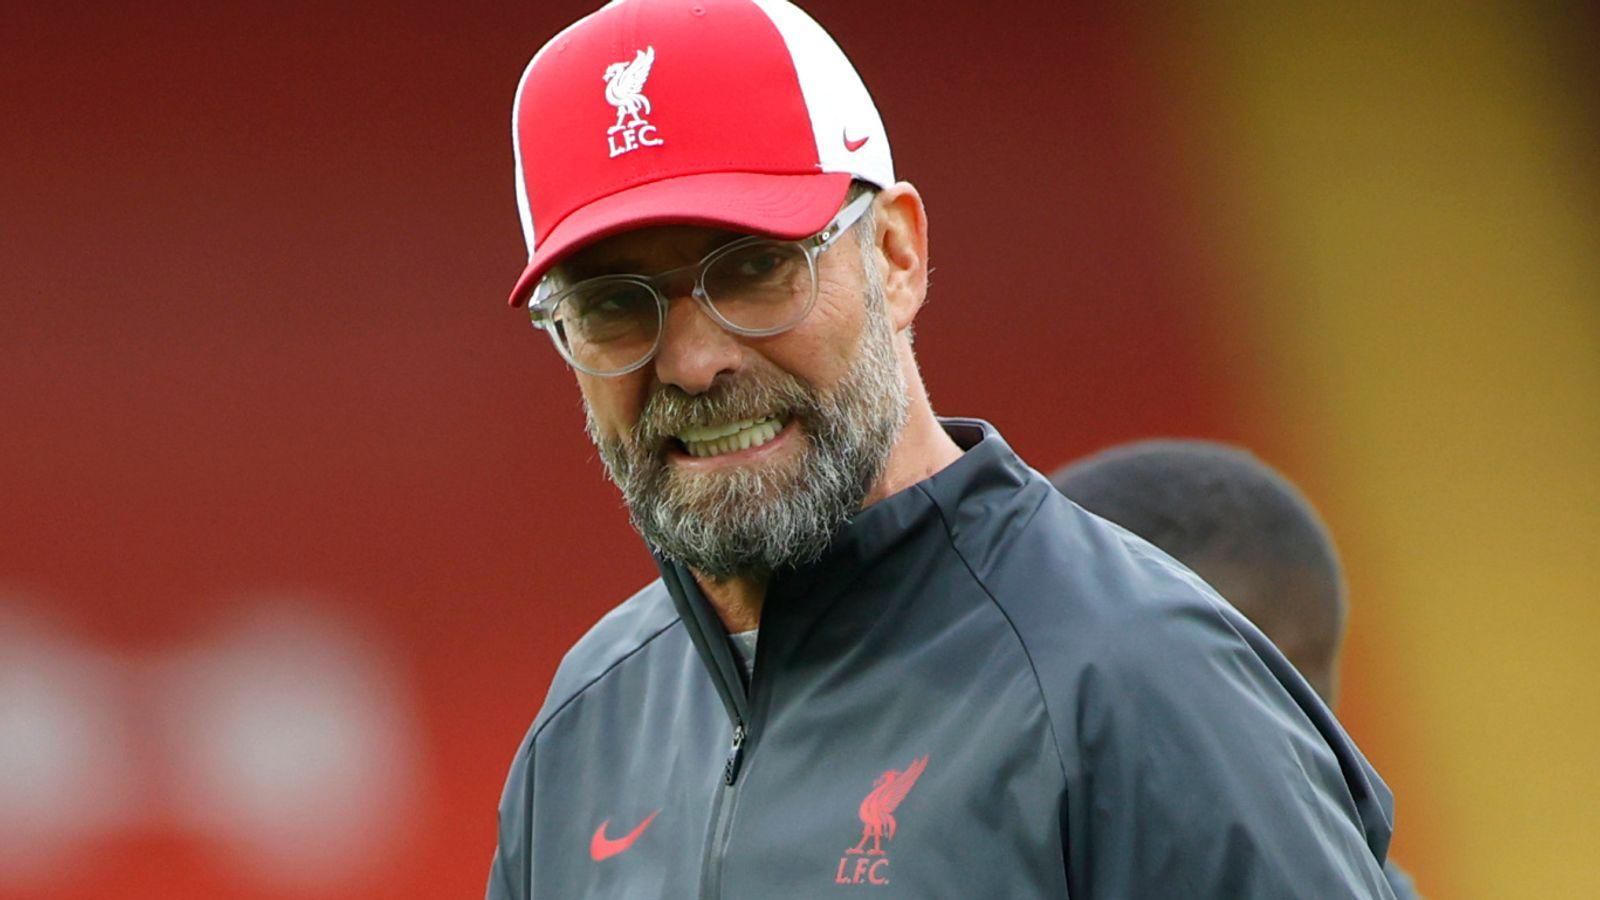 Jurgen Klopp: Liverpool ready to evolve to retain Premier League crown